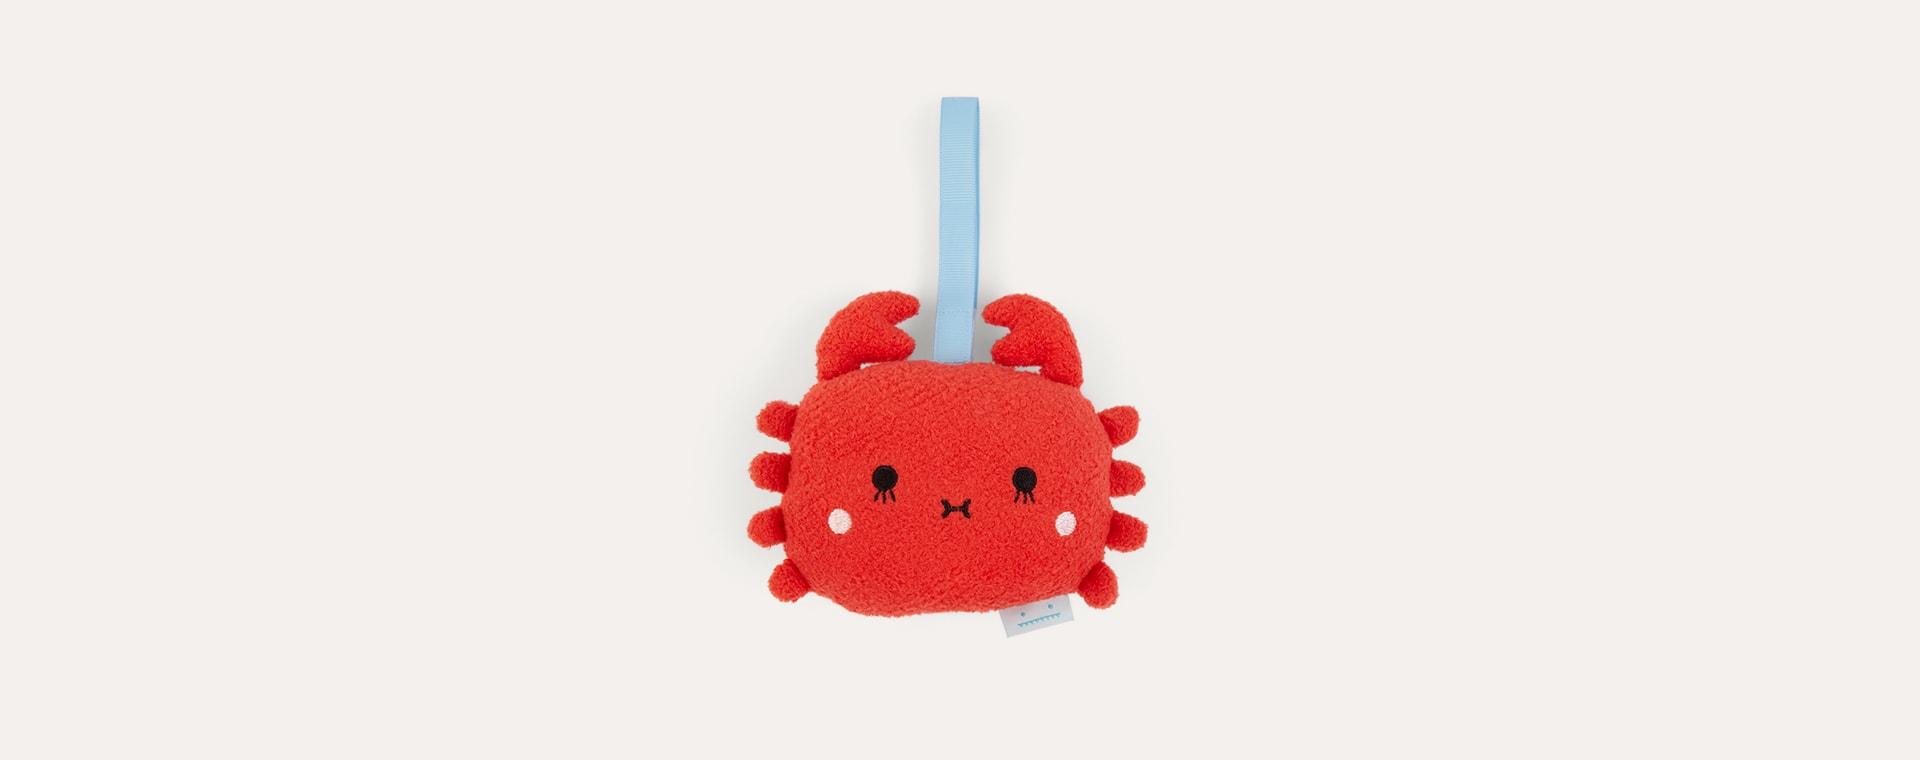 Red Noodoll Ricesurimi Crab Music Mobile